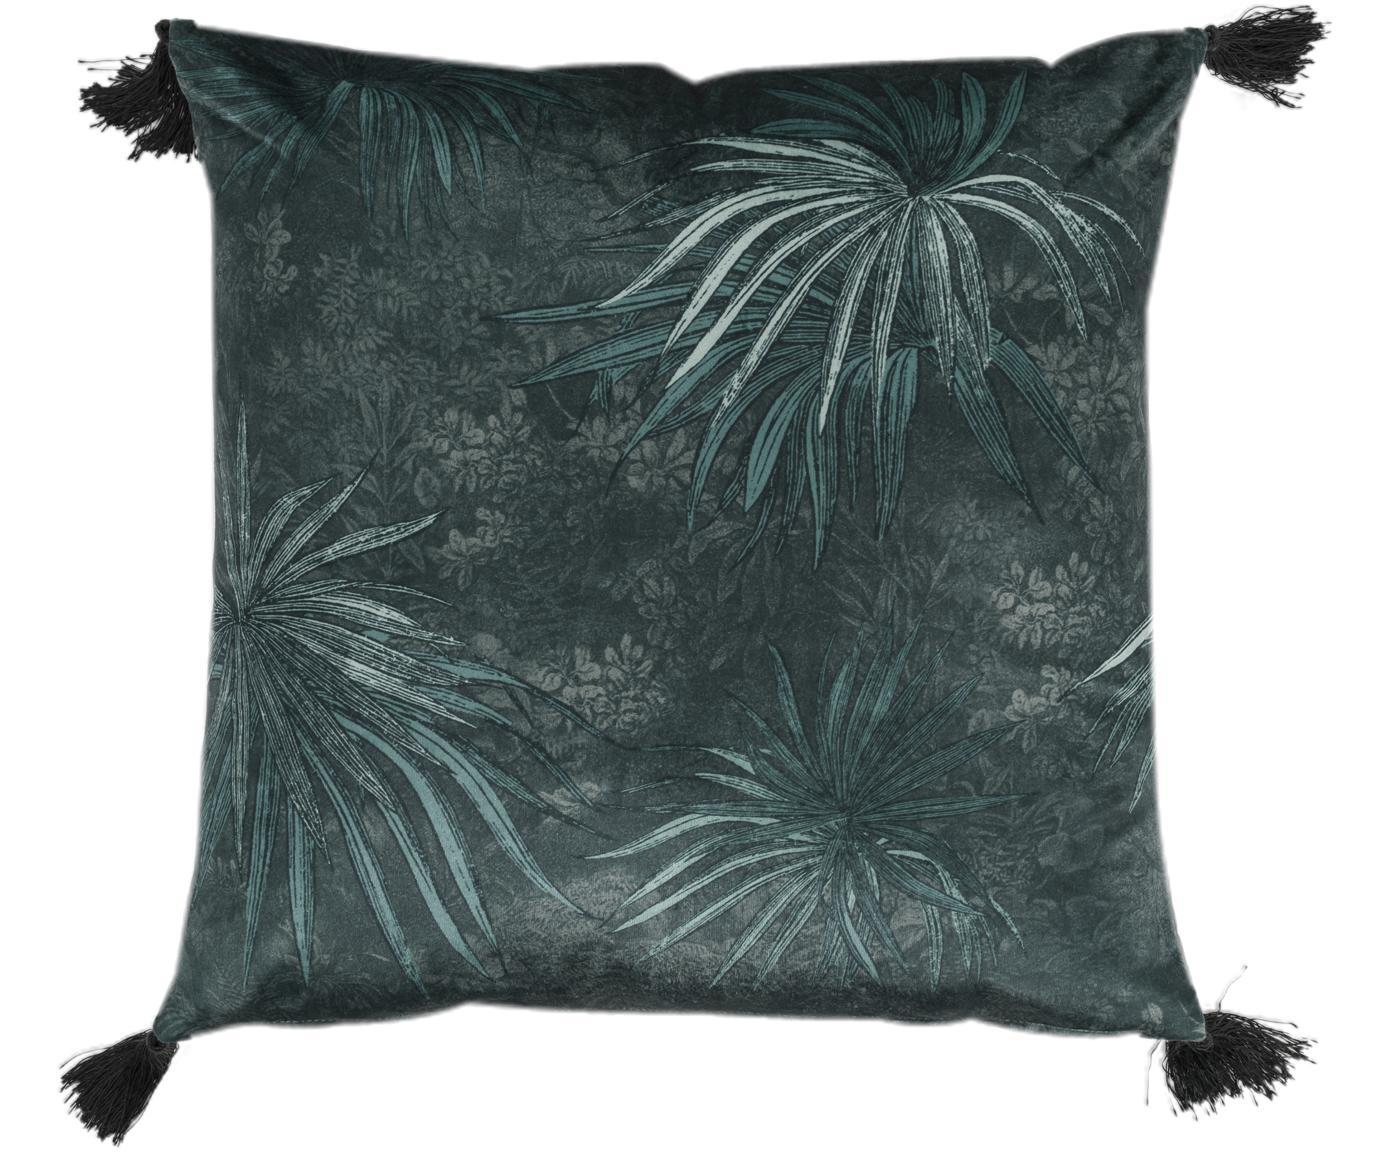 Poszewka na poduszkę Jangala, Niebieski, S 50 x D 50 cm